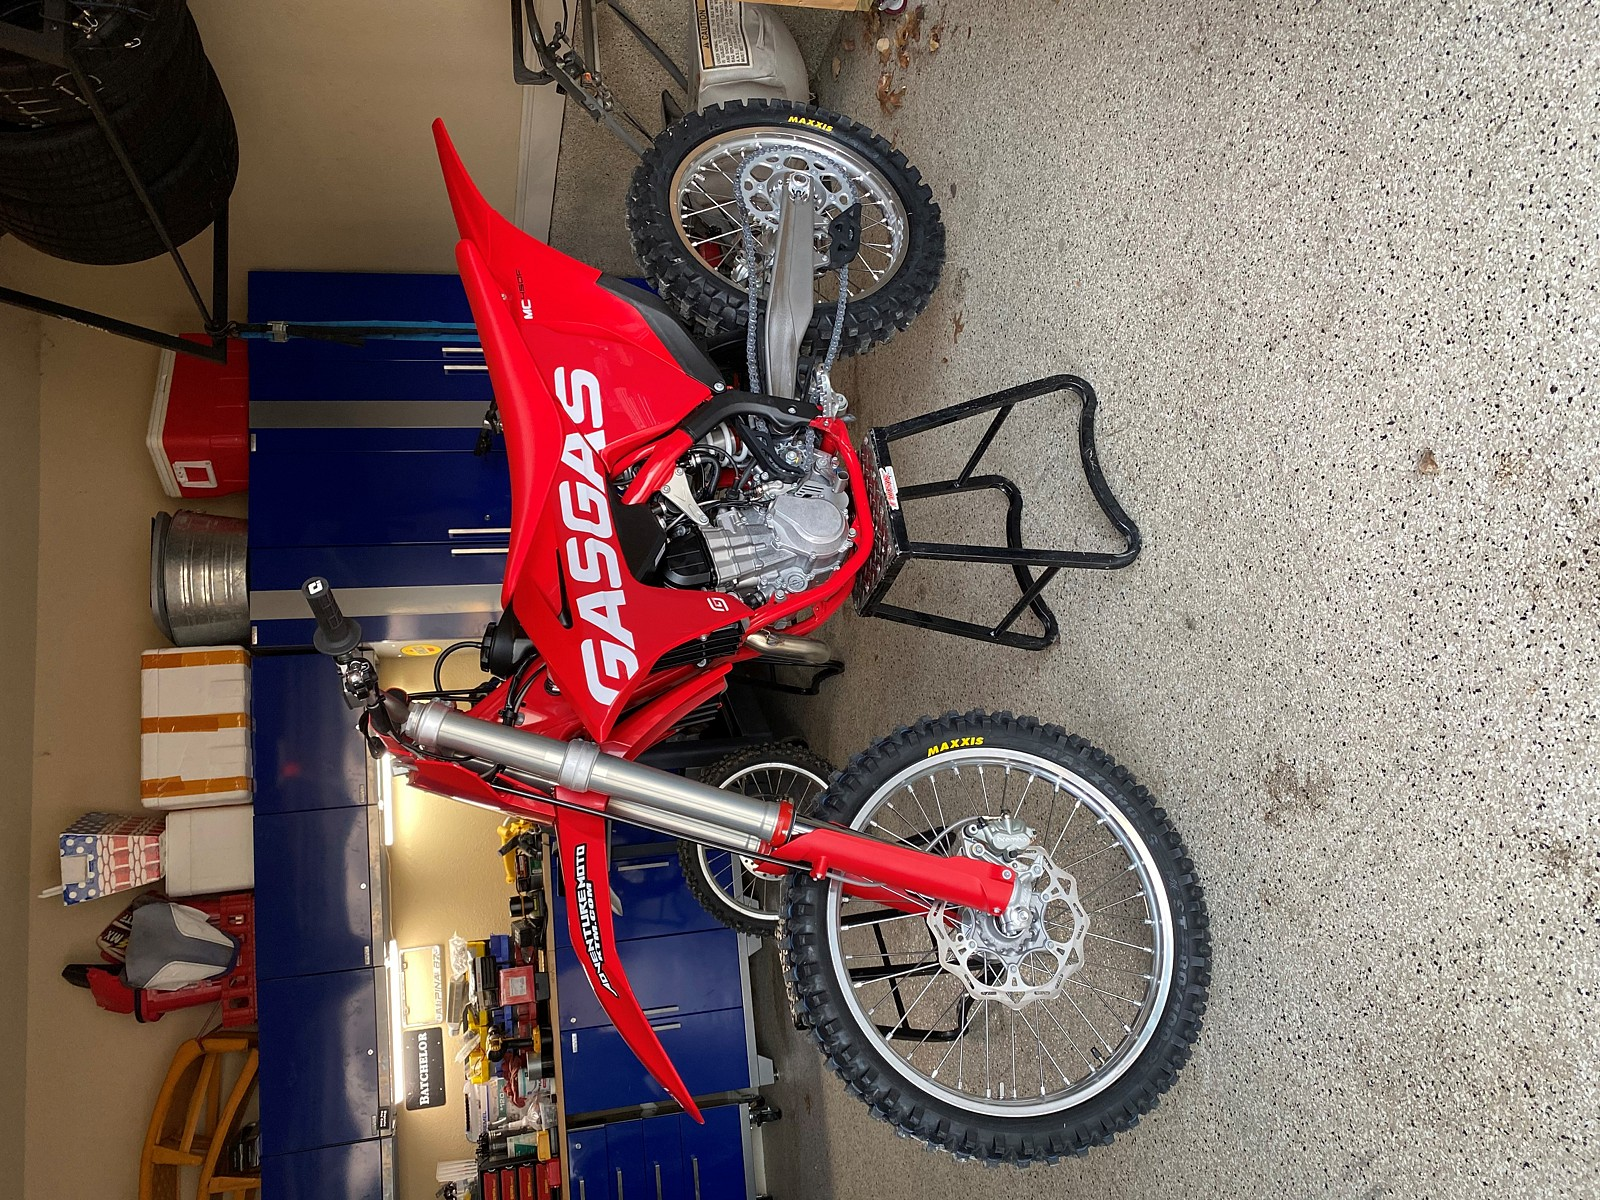 2021 GasGas MC450 - hunterp27 - Motocross Pictures - Vital MX